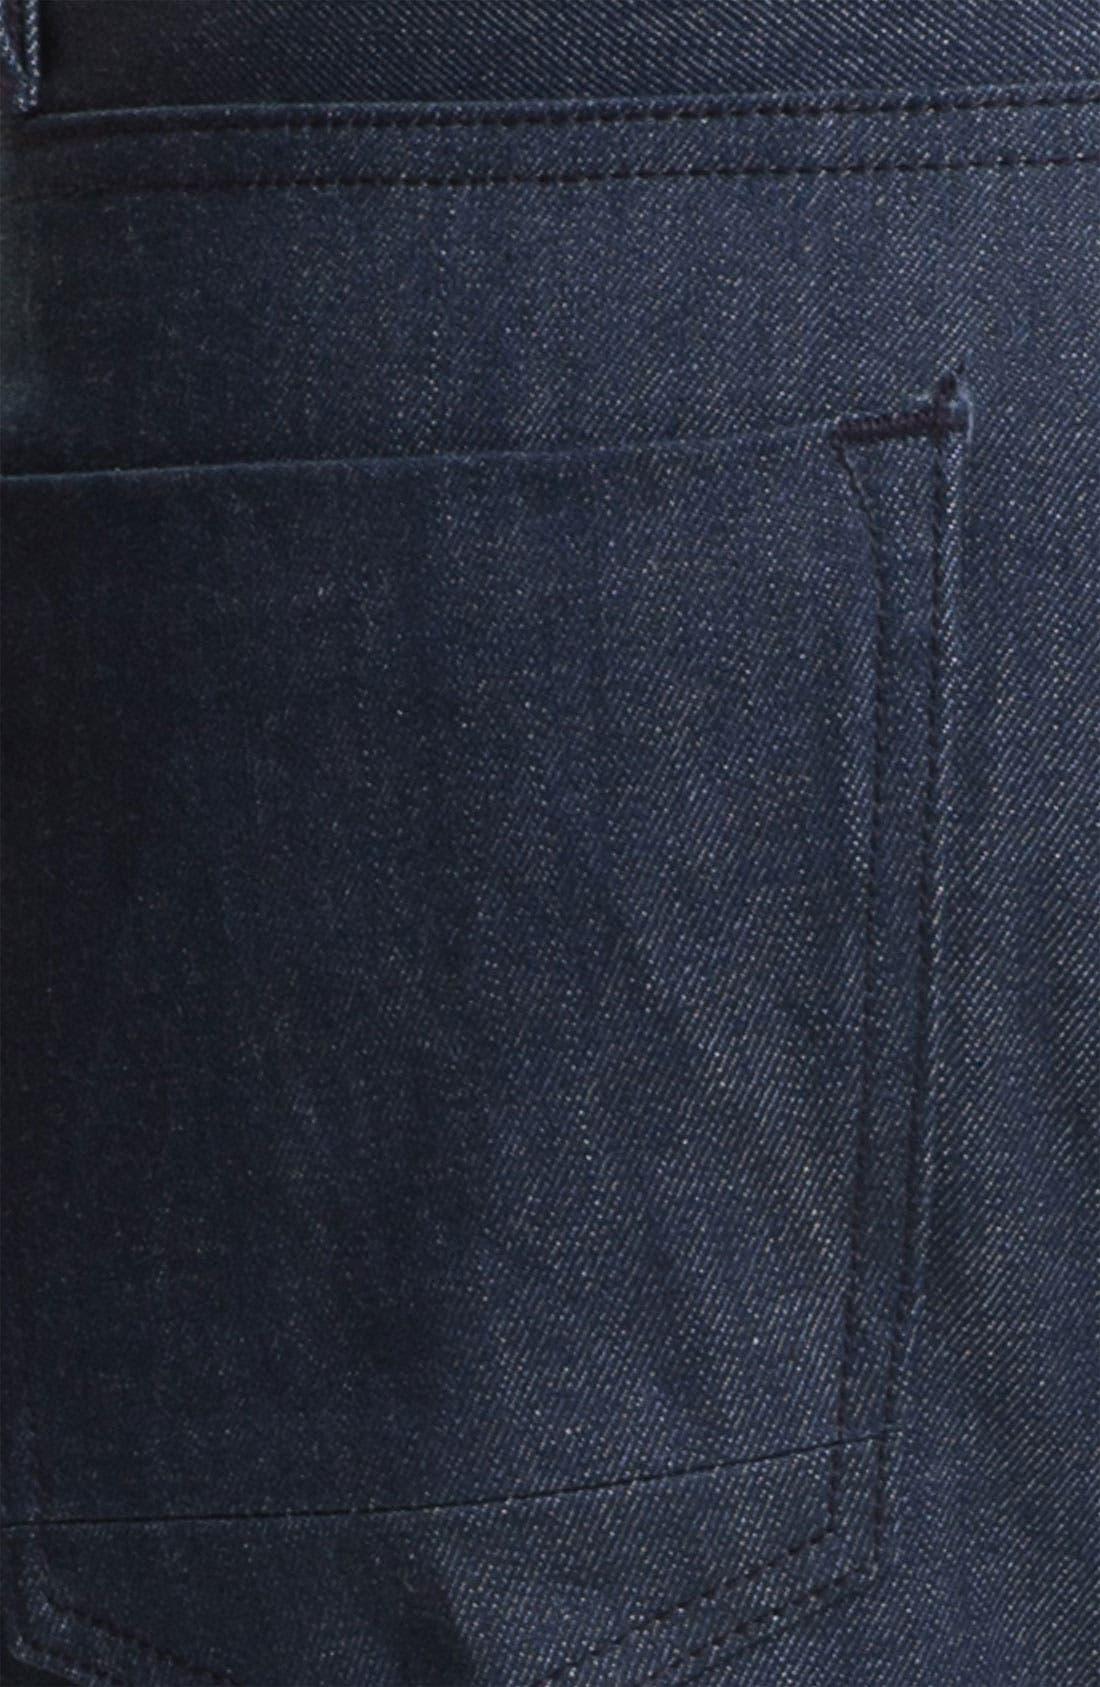 Alternate Image 3  - Denim & Leathers by Andrew Marc 'Ocean' Slim Straight Leg Raw Selvedge Jeans (Indigo)